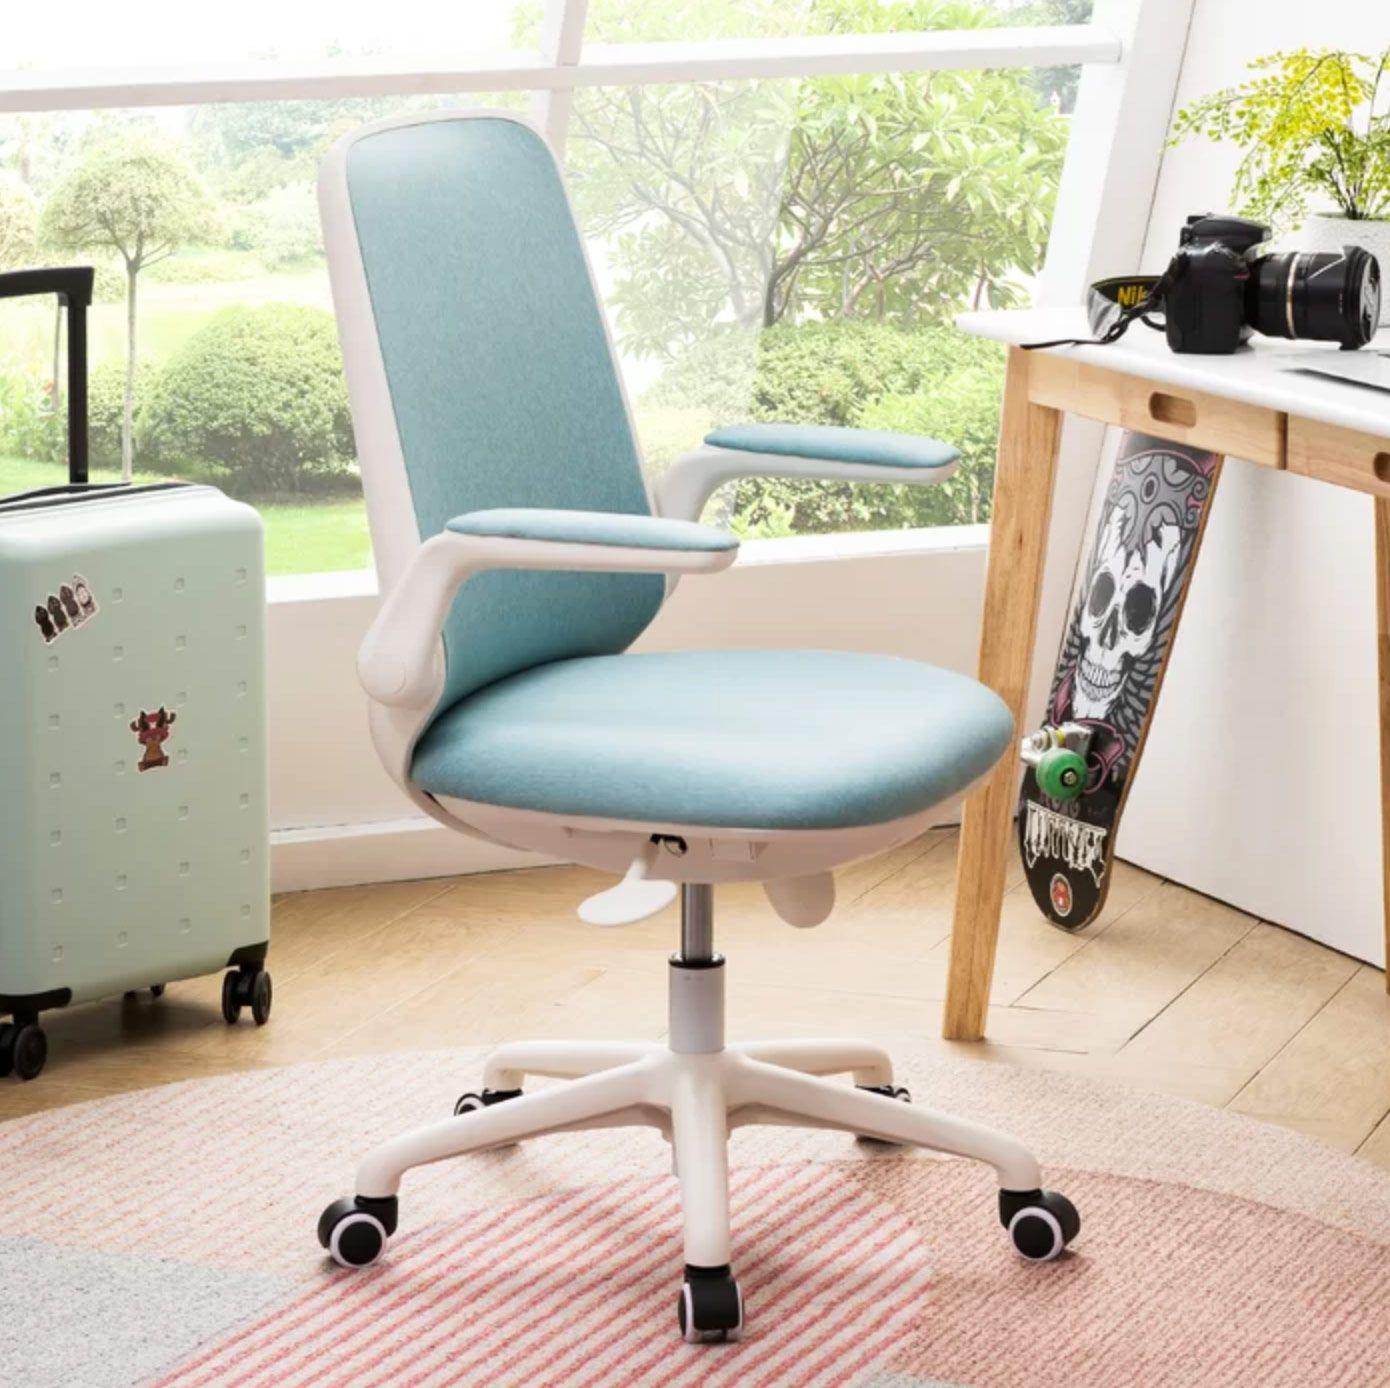 The Best Kids Desk Chairs 7 Ergonomic Chairs 2021 The Strategist New York Magazine